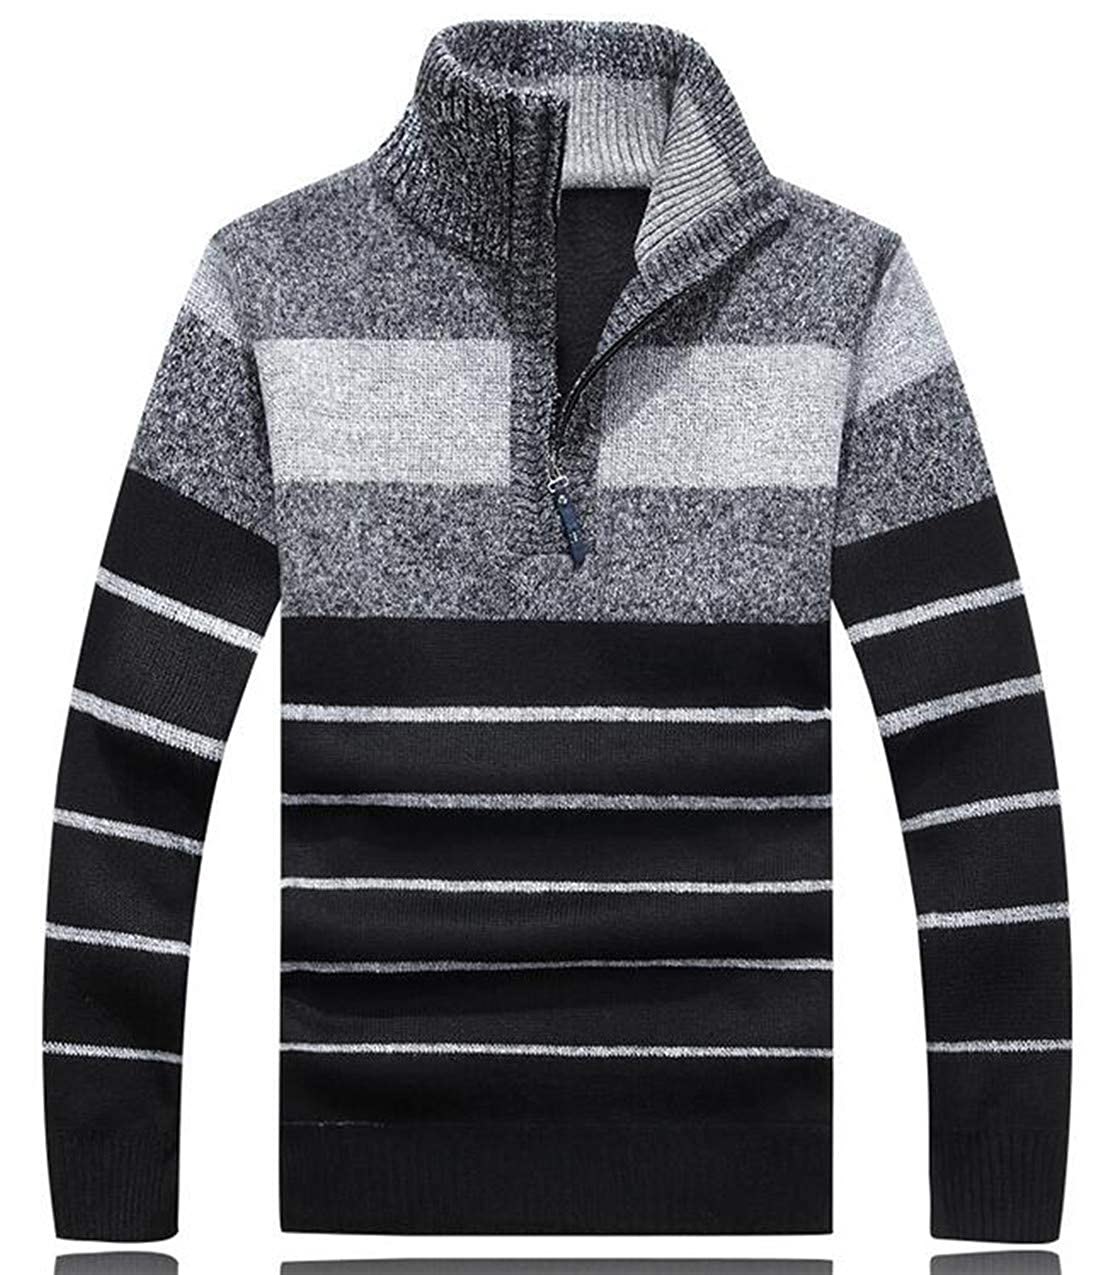 WNSY Men Pullover Turtel Neck Half Zip Striped Patchwork Slim Fit Knit Sweater